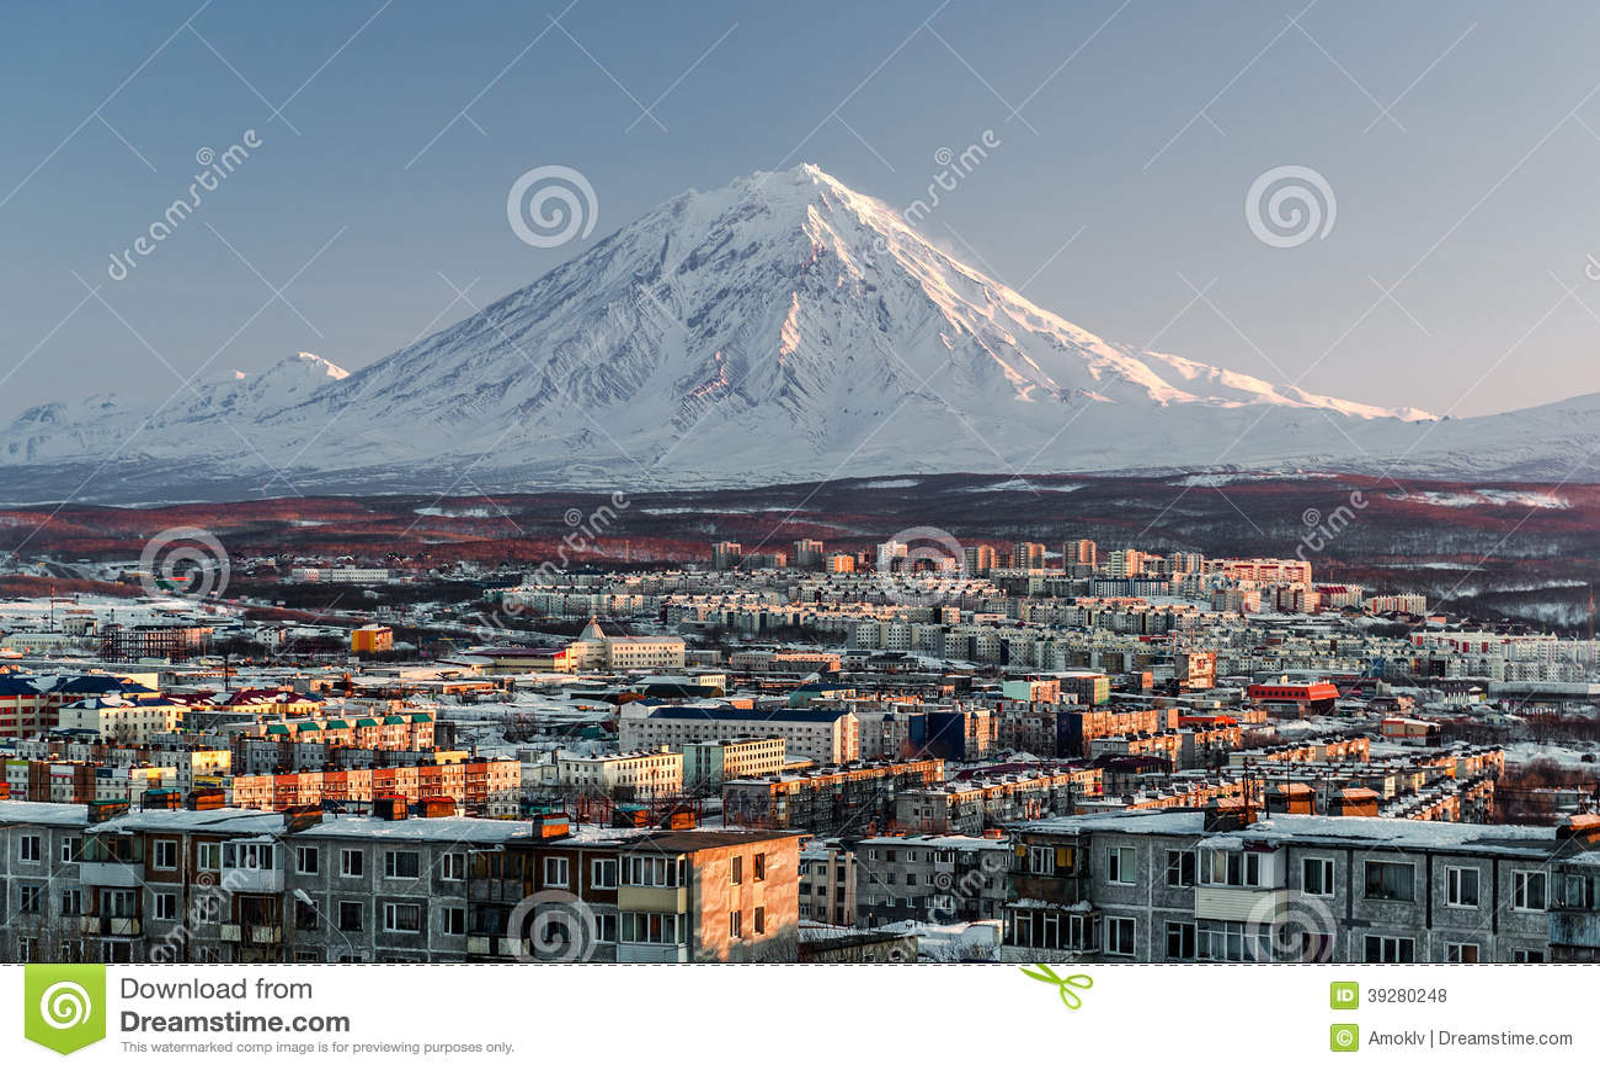 Paysage urbain de Petropavlovsk-Kamchatsky et volcan de Koryaksky